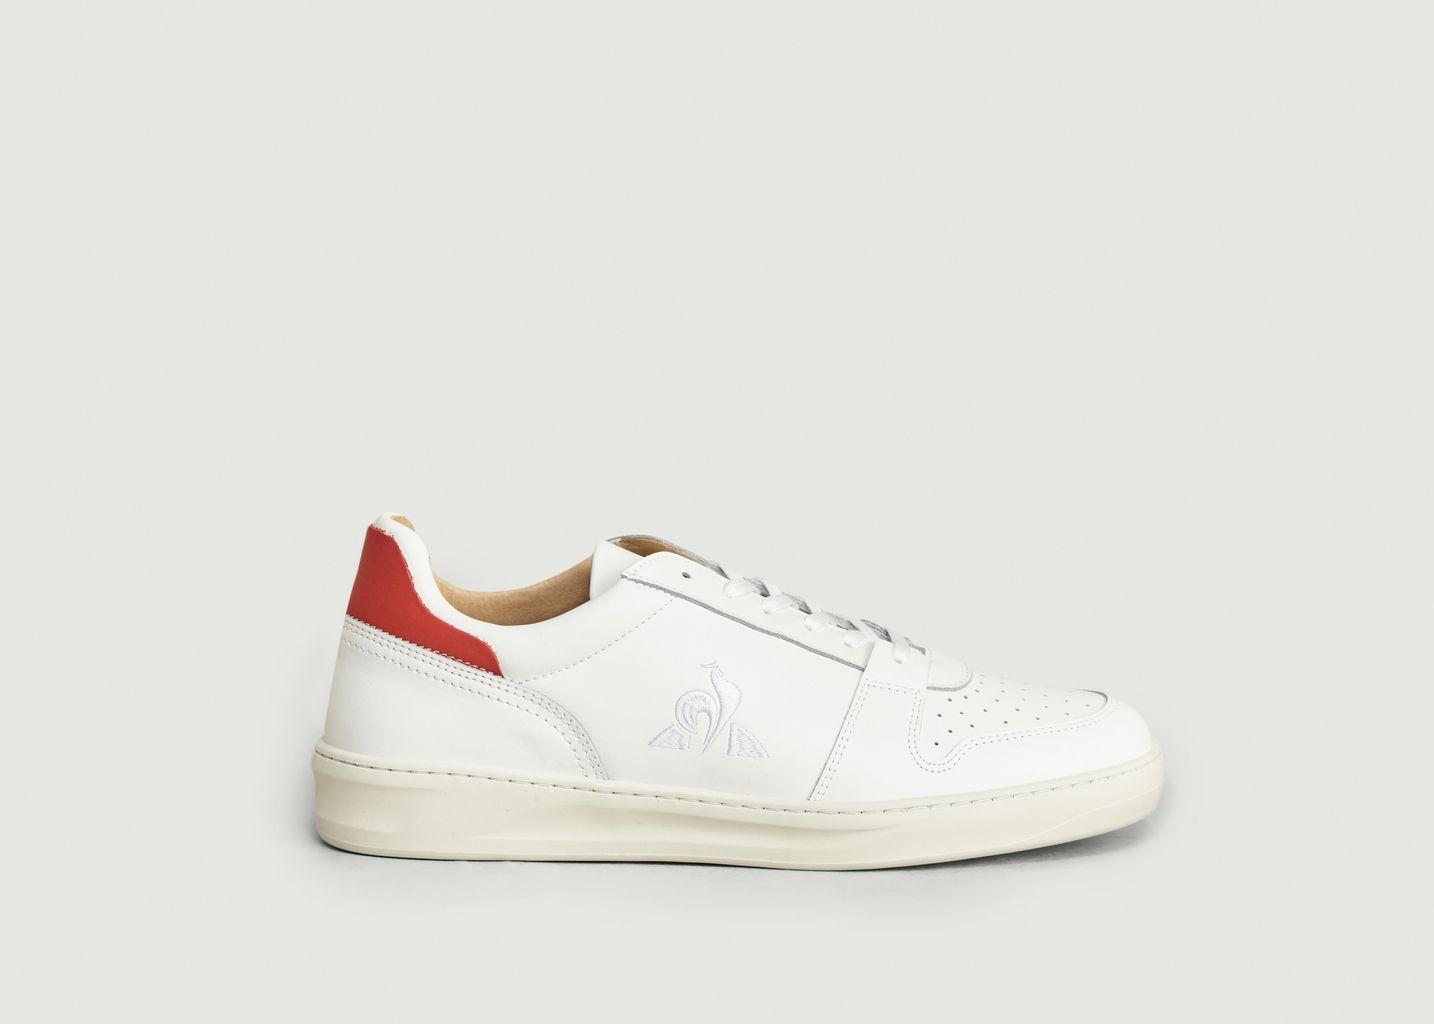 Sneakers Esthete tricolore - Le Coq Sportif